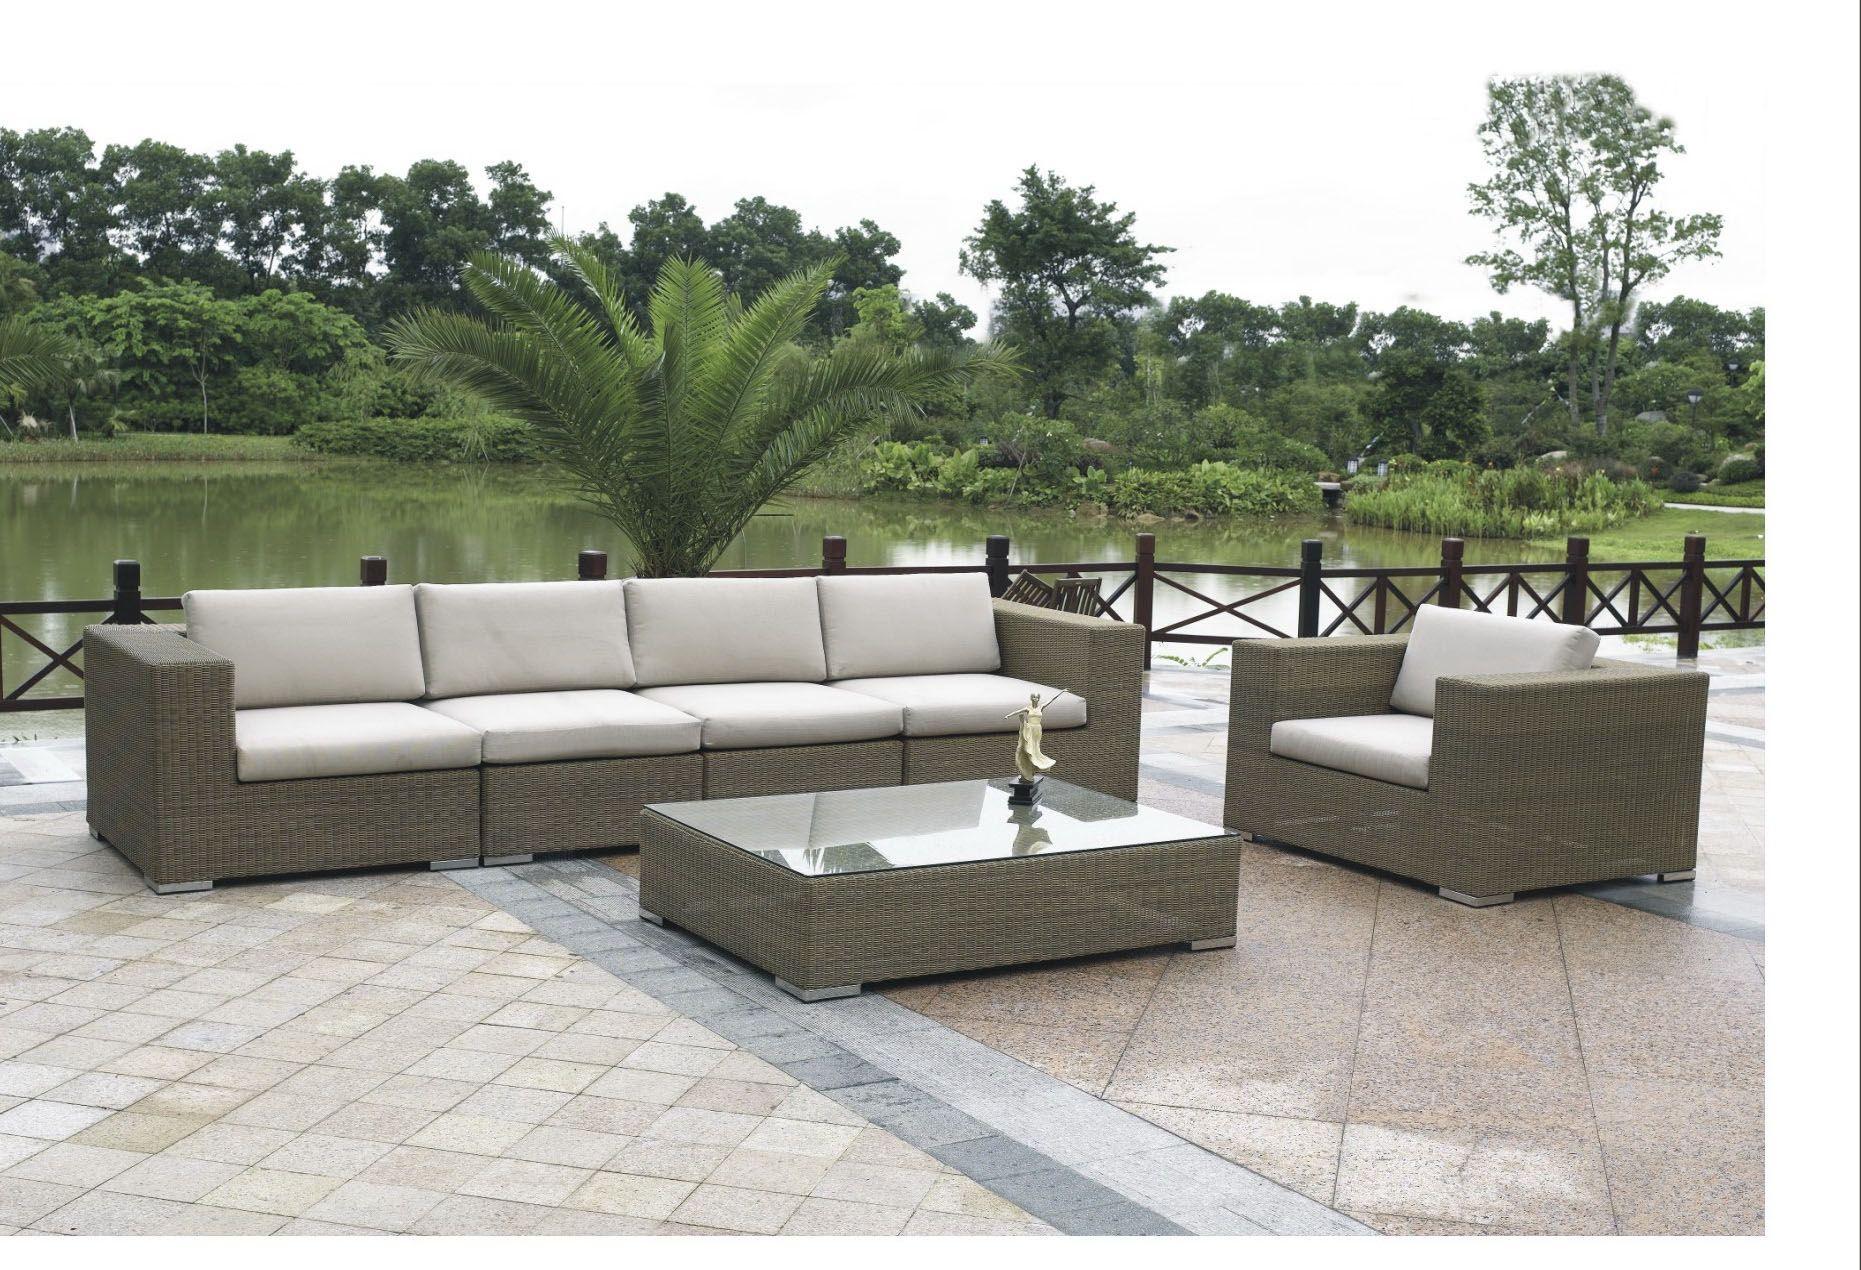 5 Seater Sofa Set Under 10000